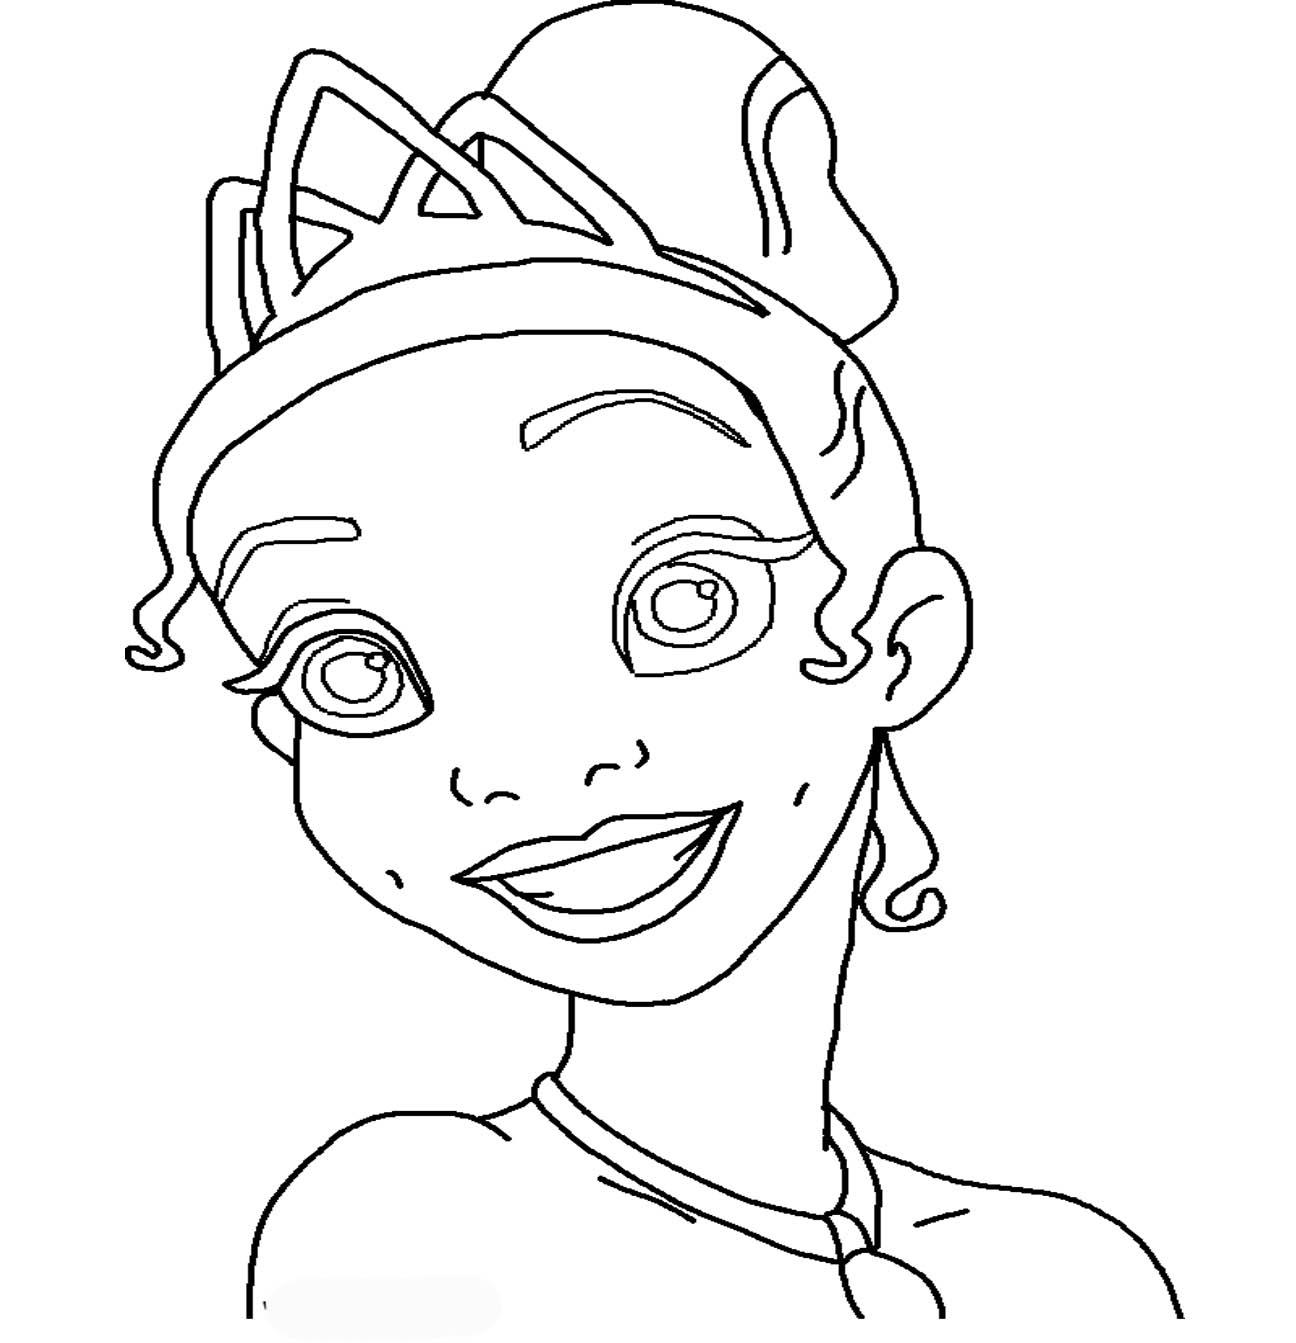 Disney Princess Tiana Coloring Pages To Girls